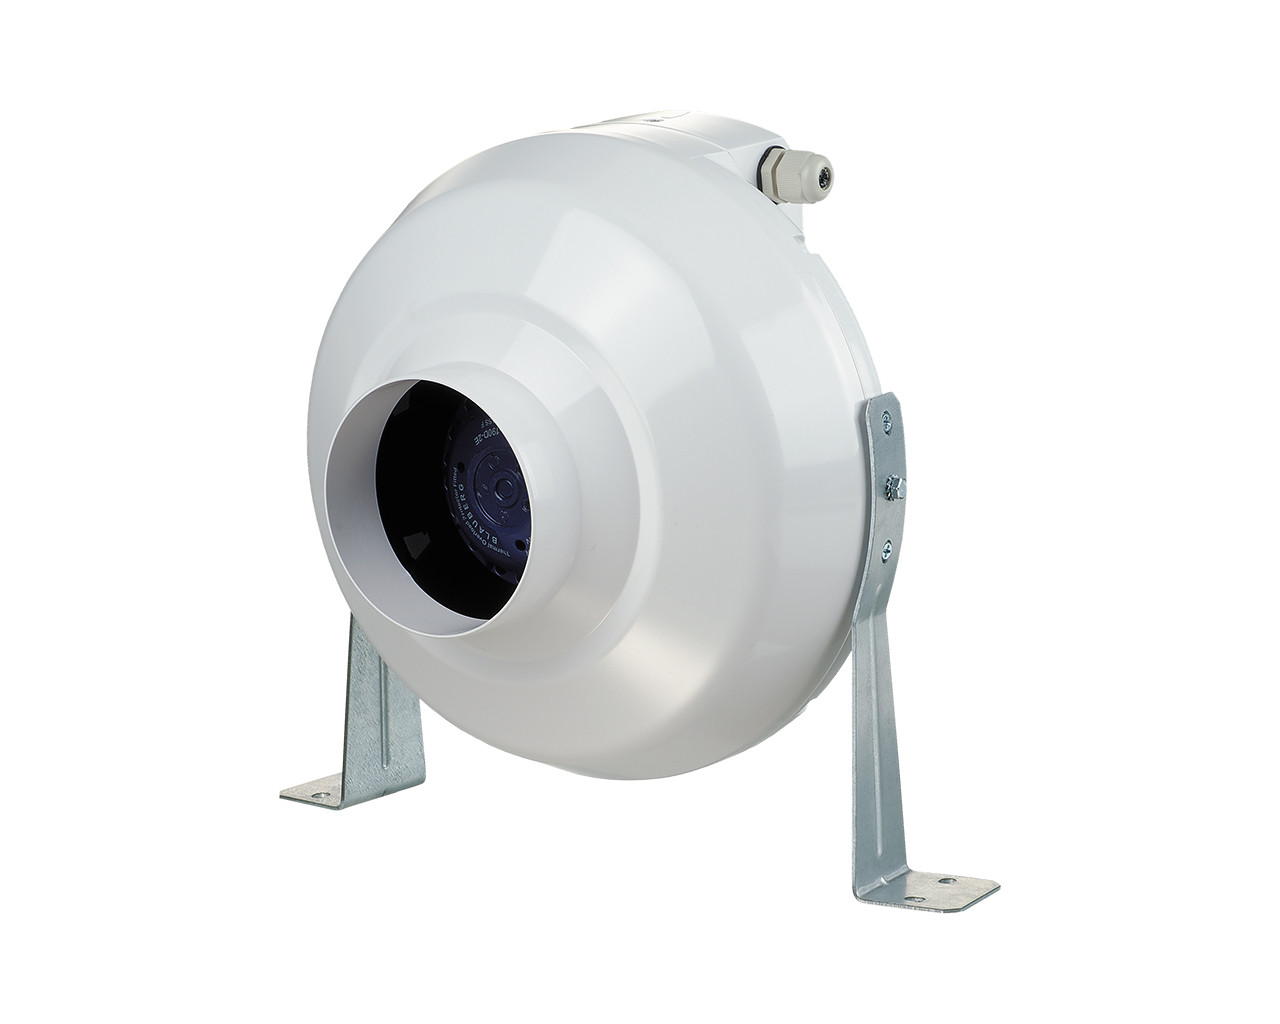 Kunststof Buisventilator 100mm Ø / 250m3/h (type) BK